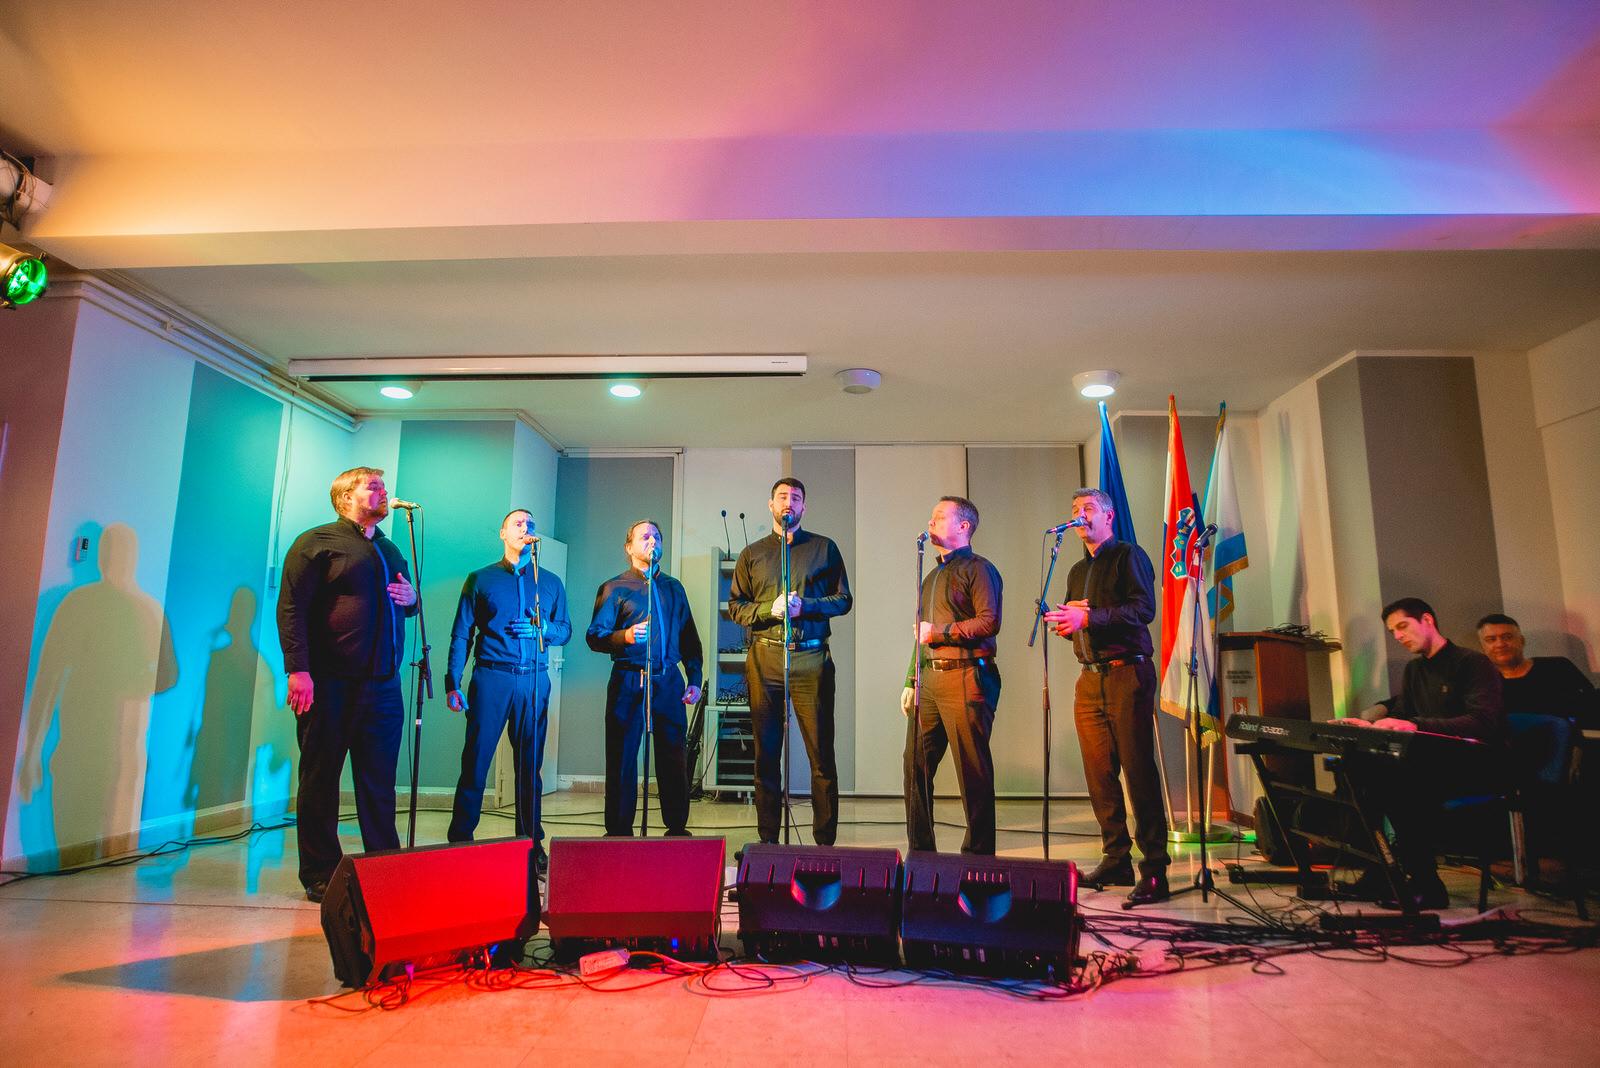 likaclub_koncert-klapa-cambi_kic-gospić_2019-18